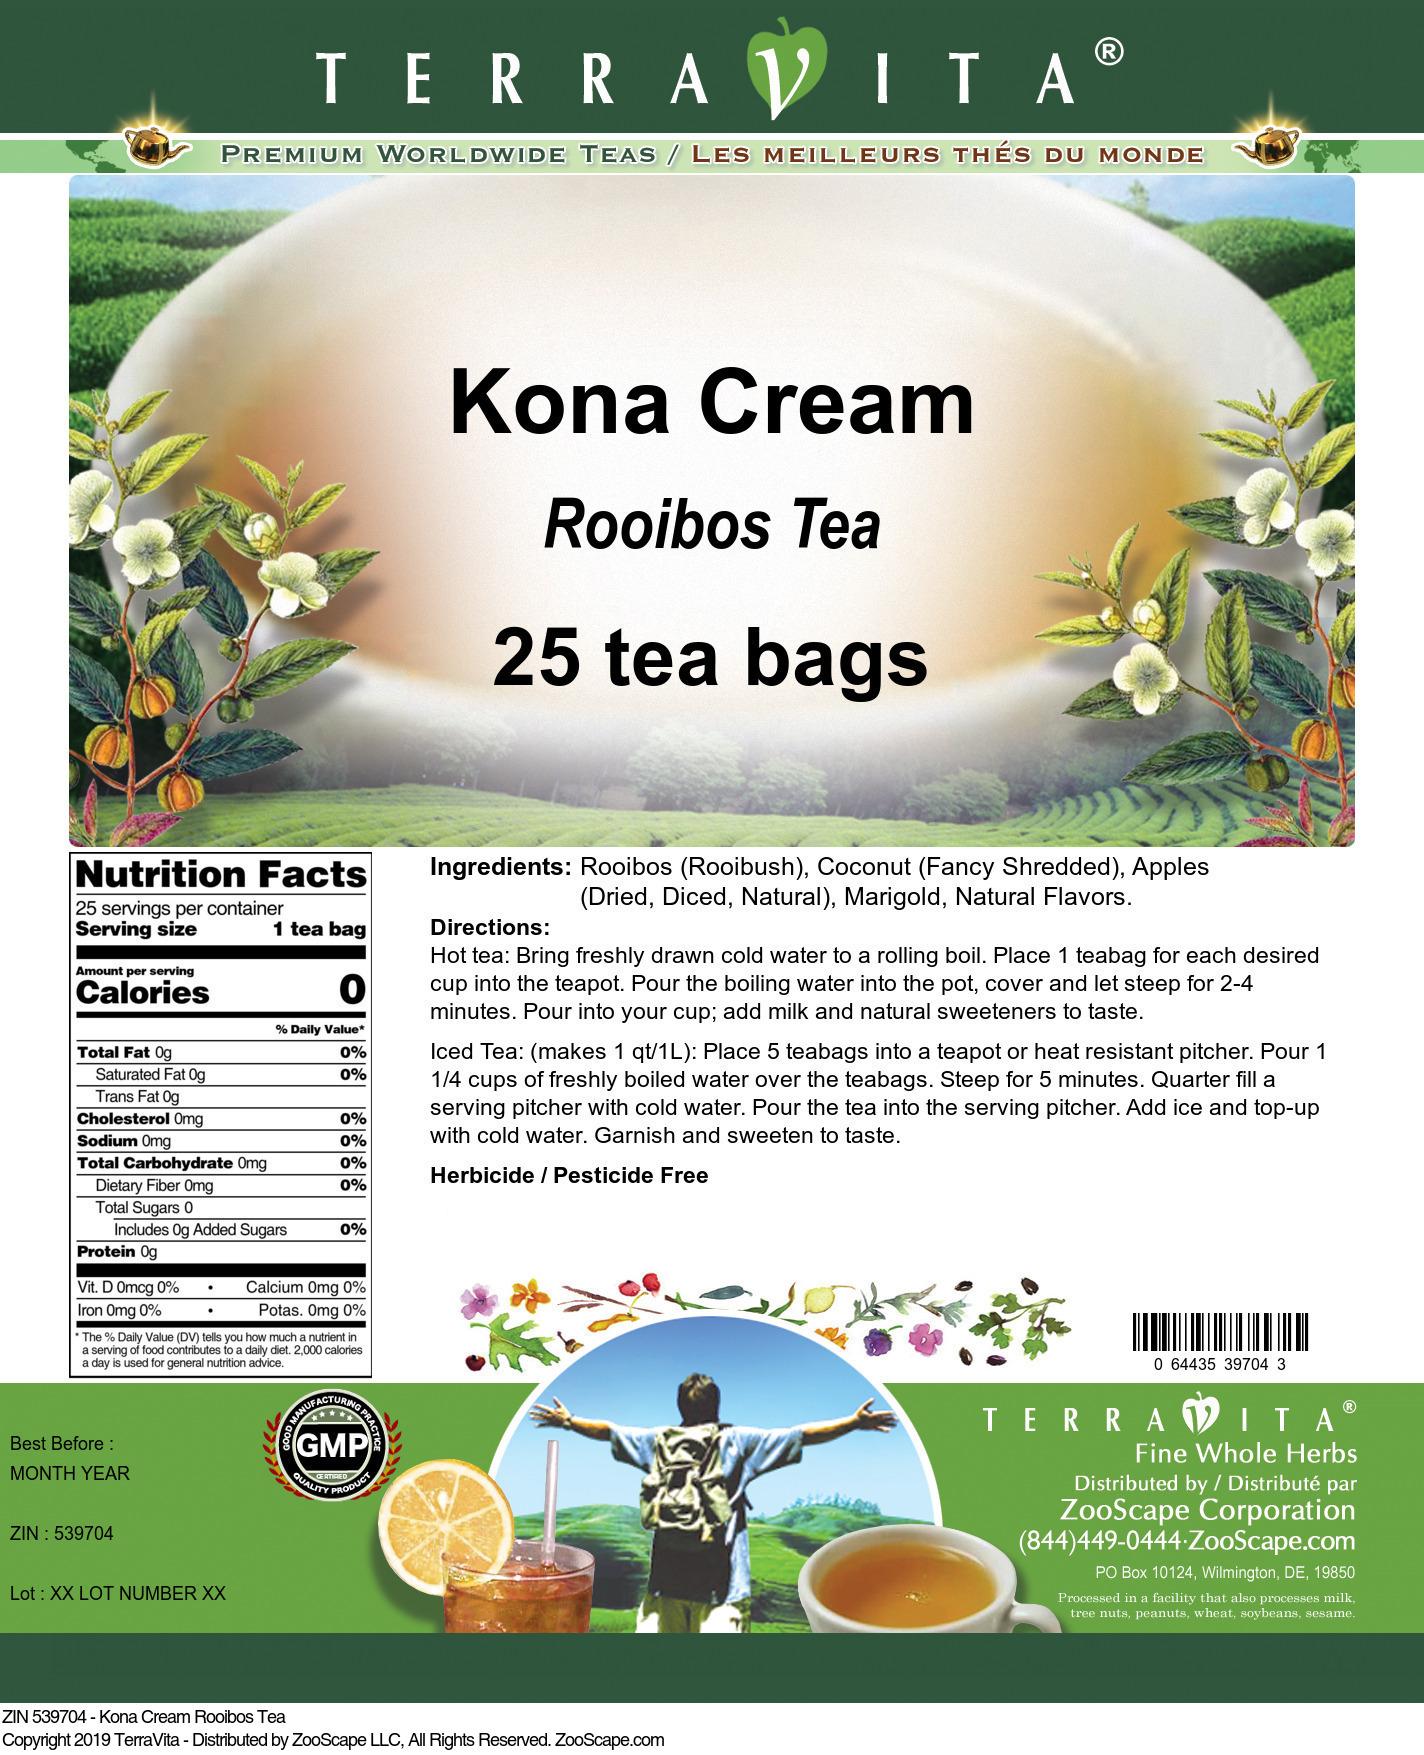 Kona Cream Rooibos Tea